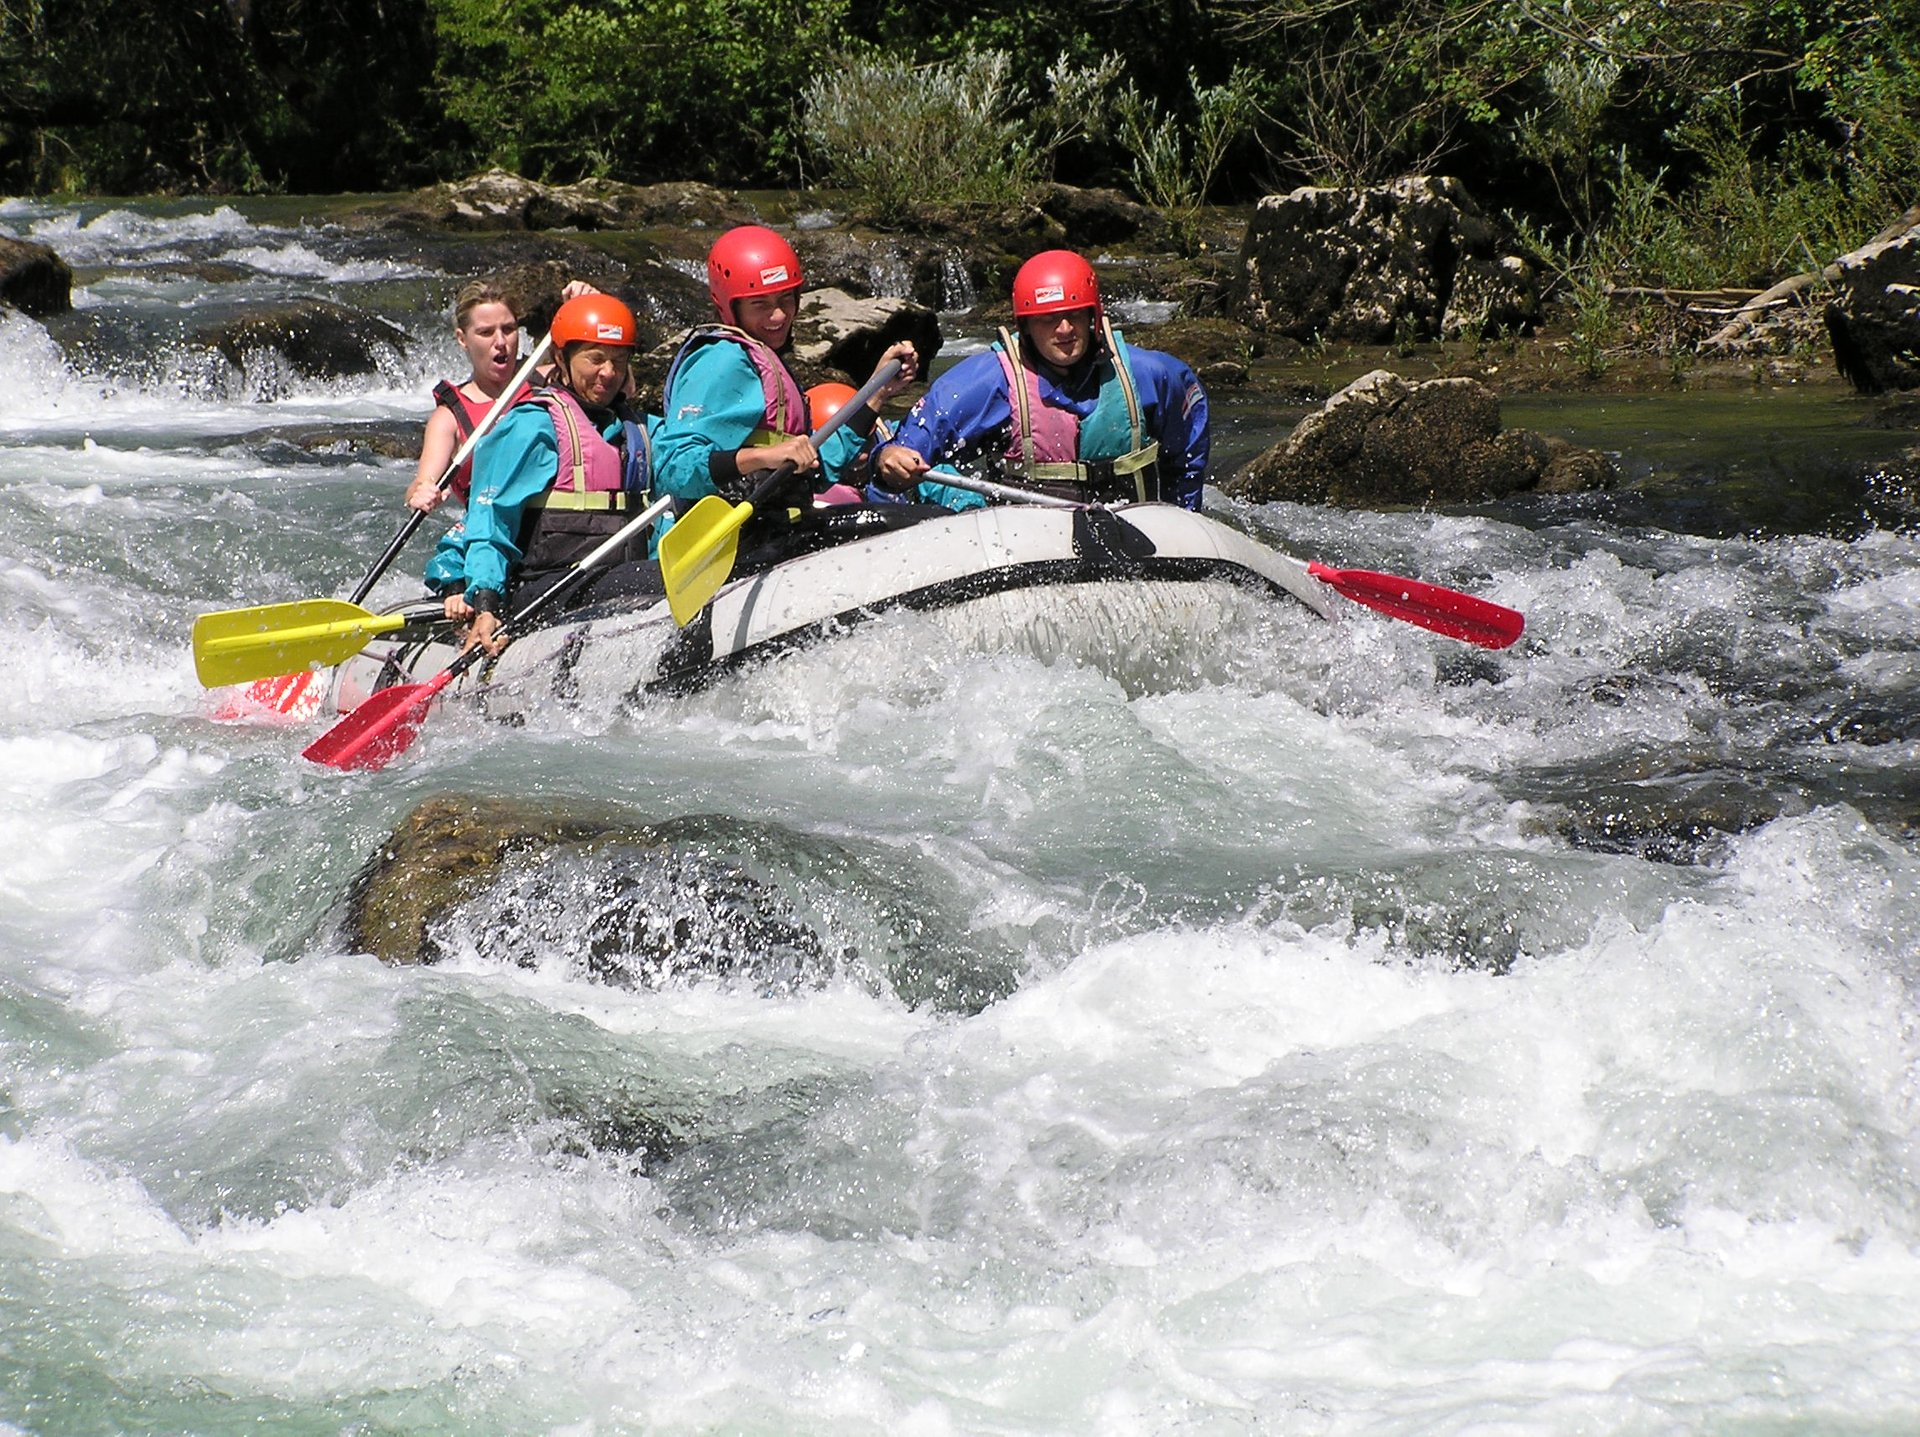 White Water Rafting in Croatia 2020 - Best Time